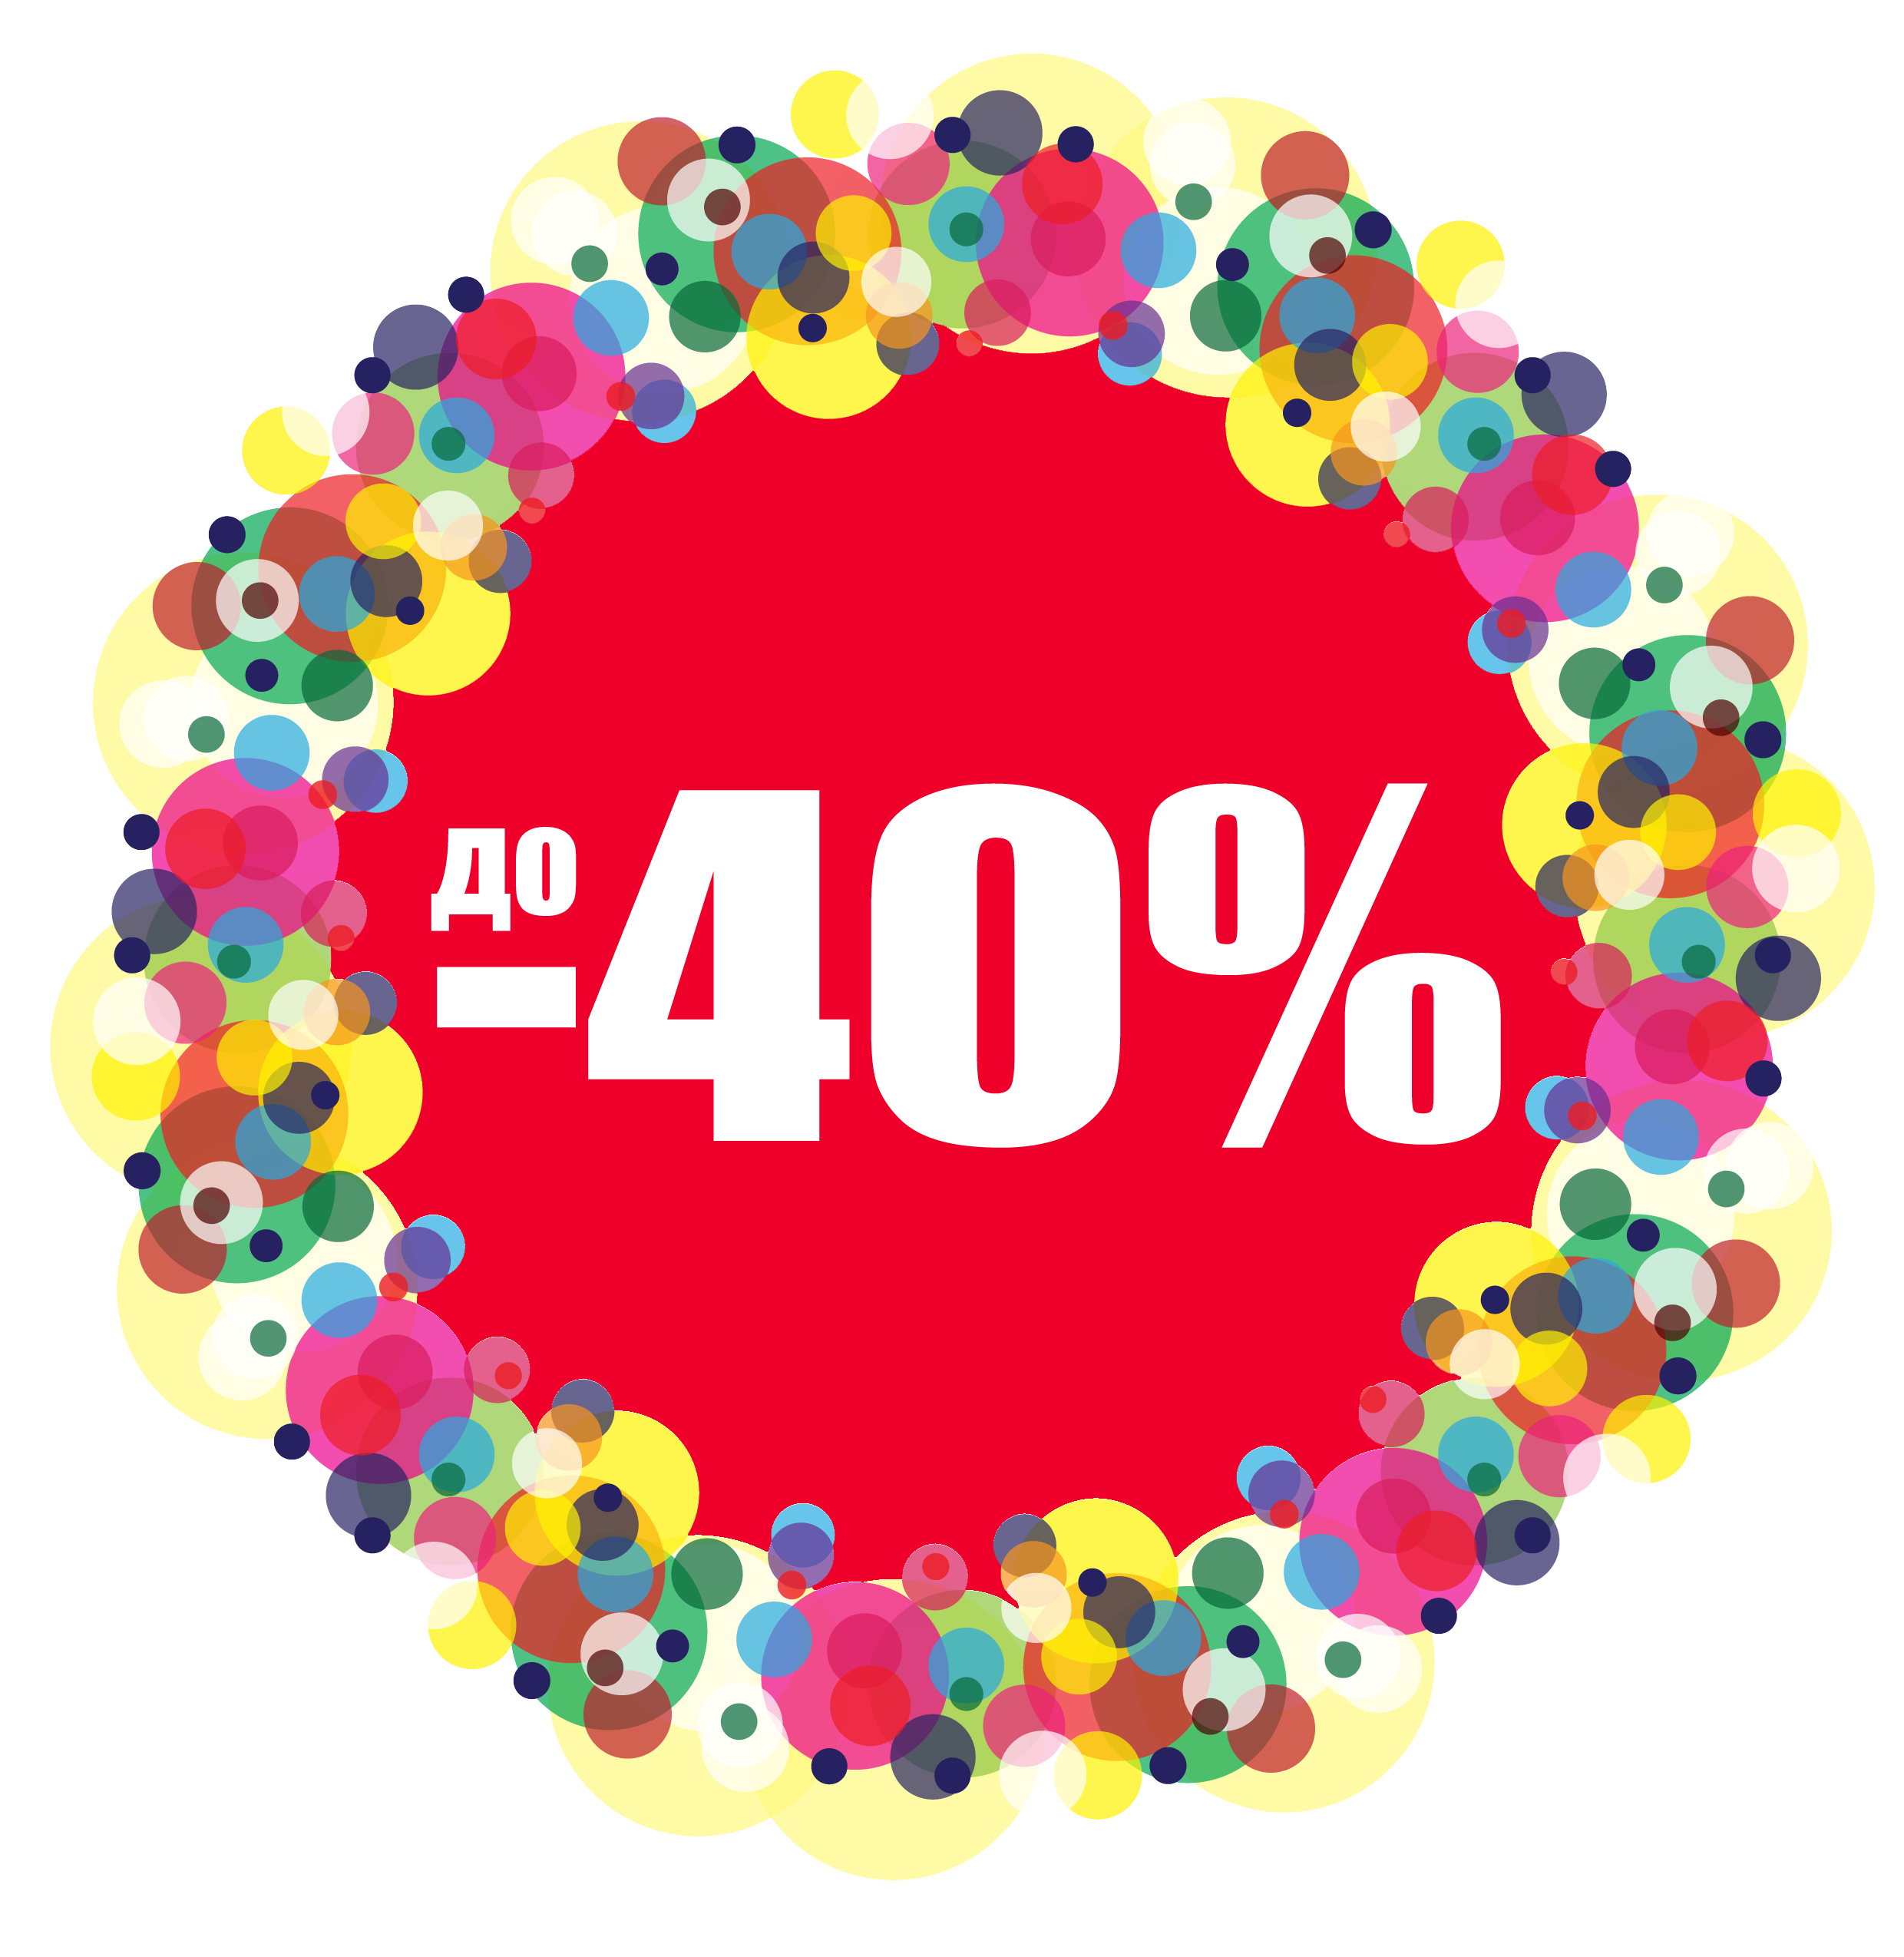 ���� �������. ������������� Sabellino-45. ���������� ������� ���������. ������ �� 40%. ����� �������������� ��������� �����-���� 2016